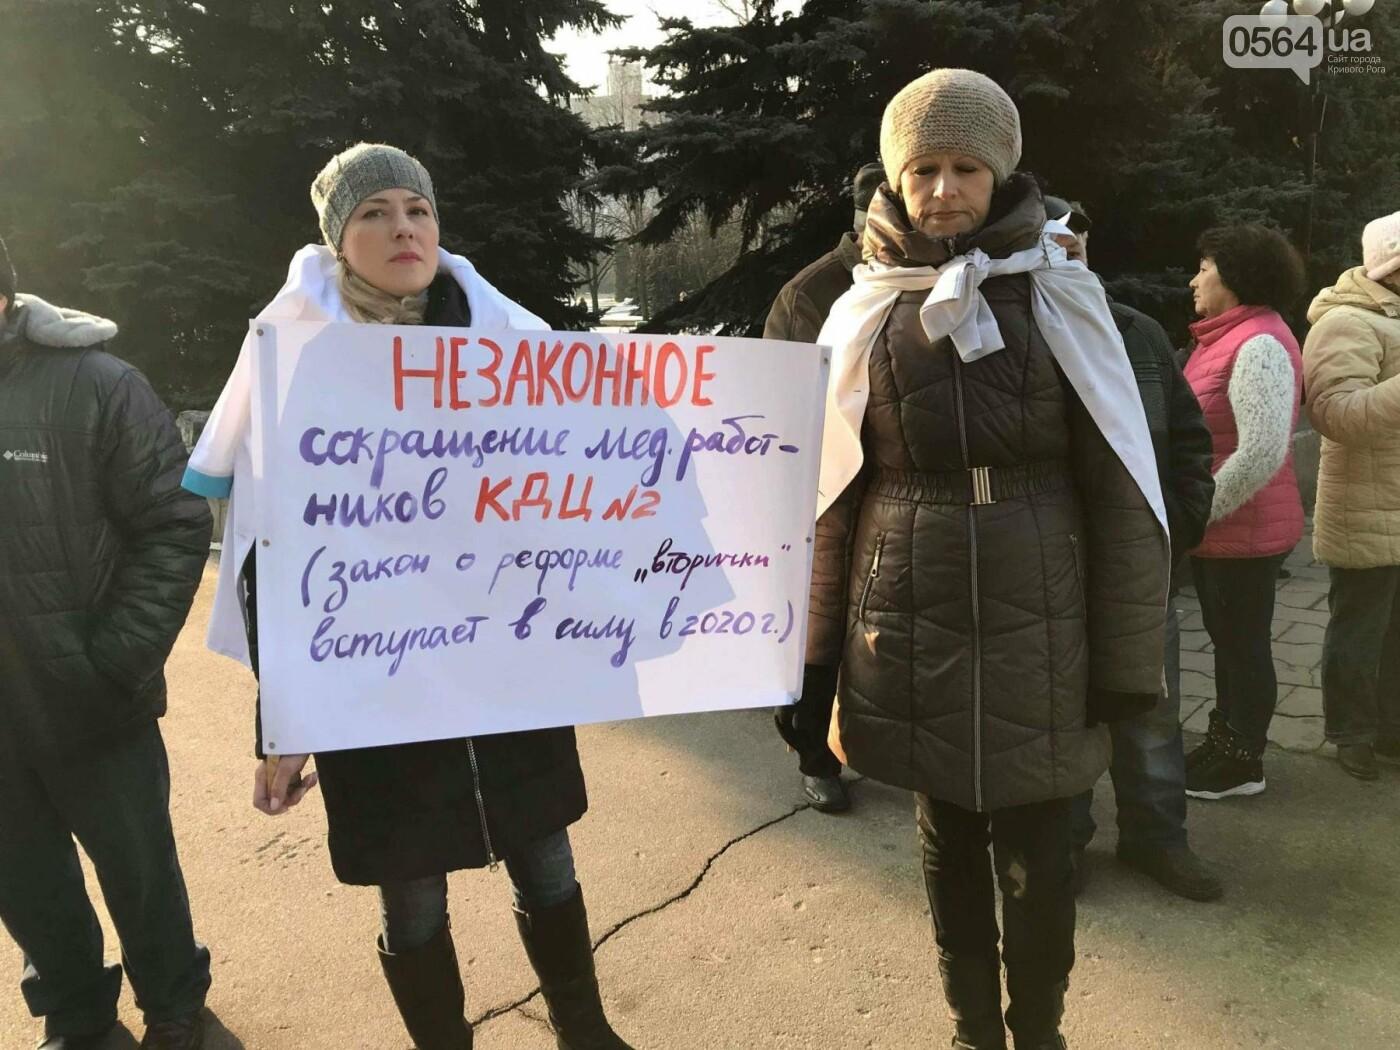 Под стенами Криворожского горисполкома проходит акция протеста медиков (ФОТО), фото-4